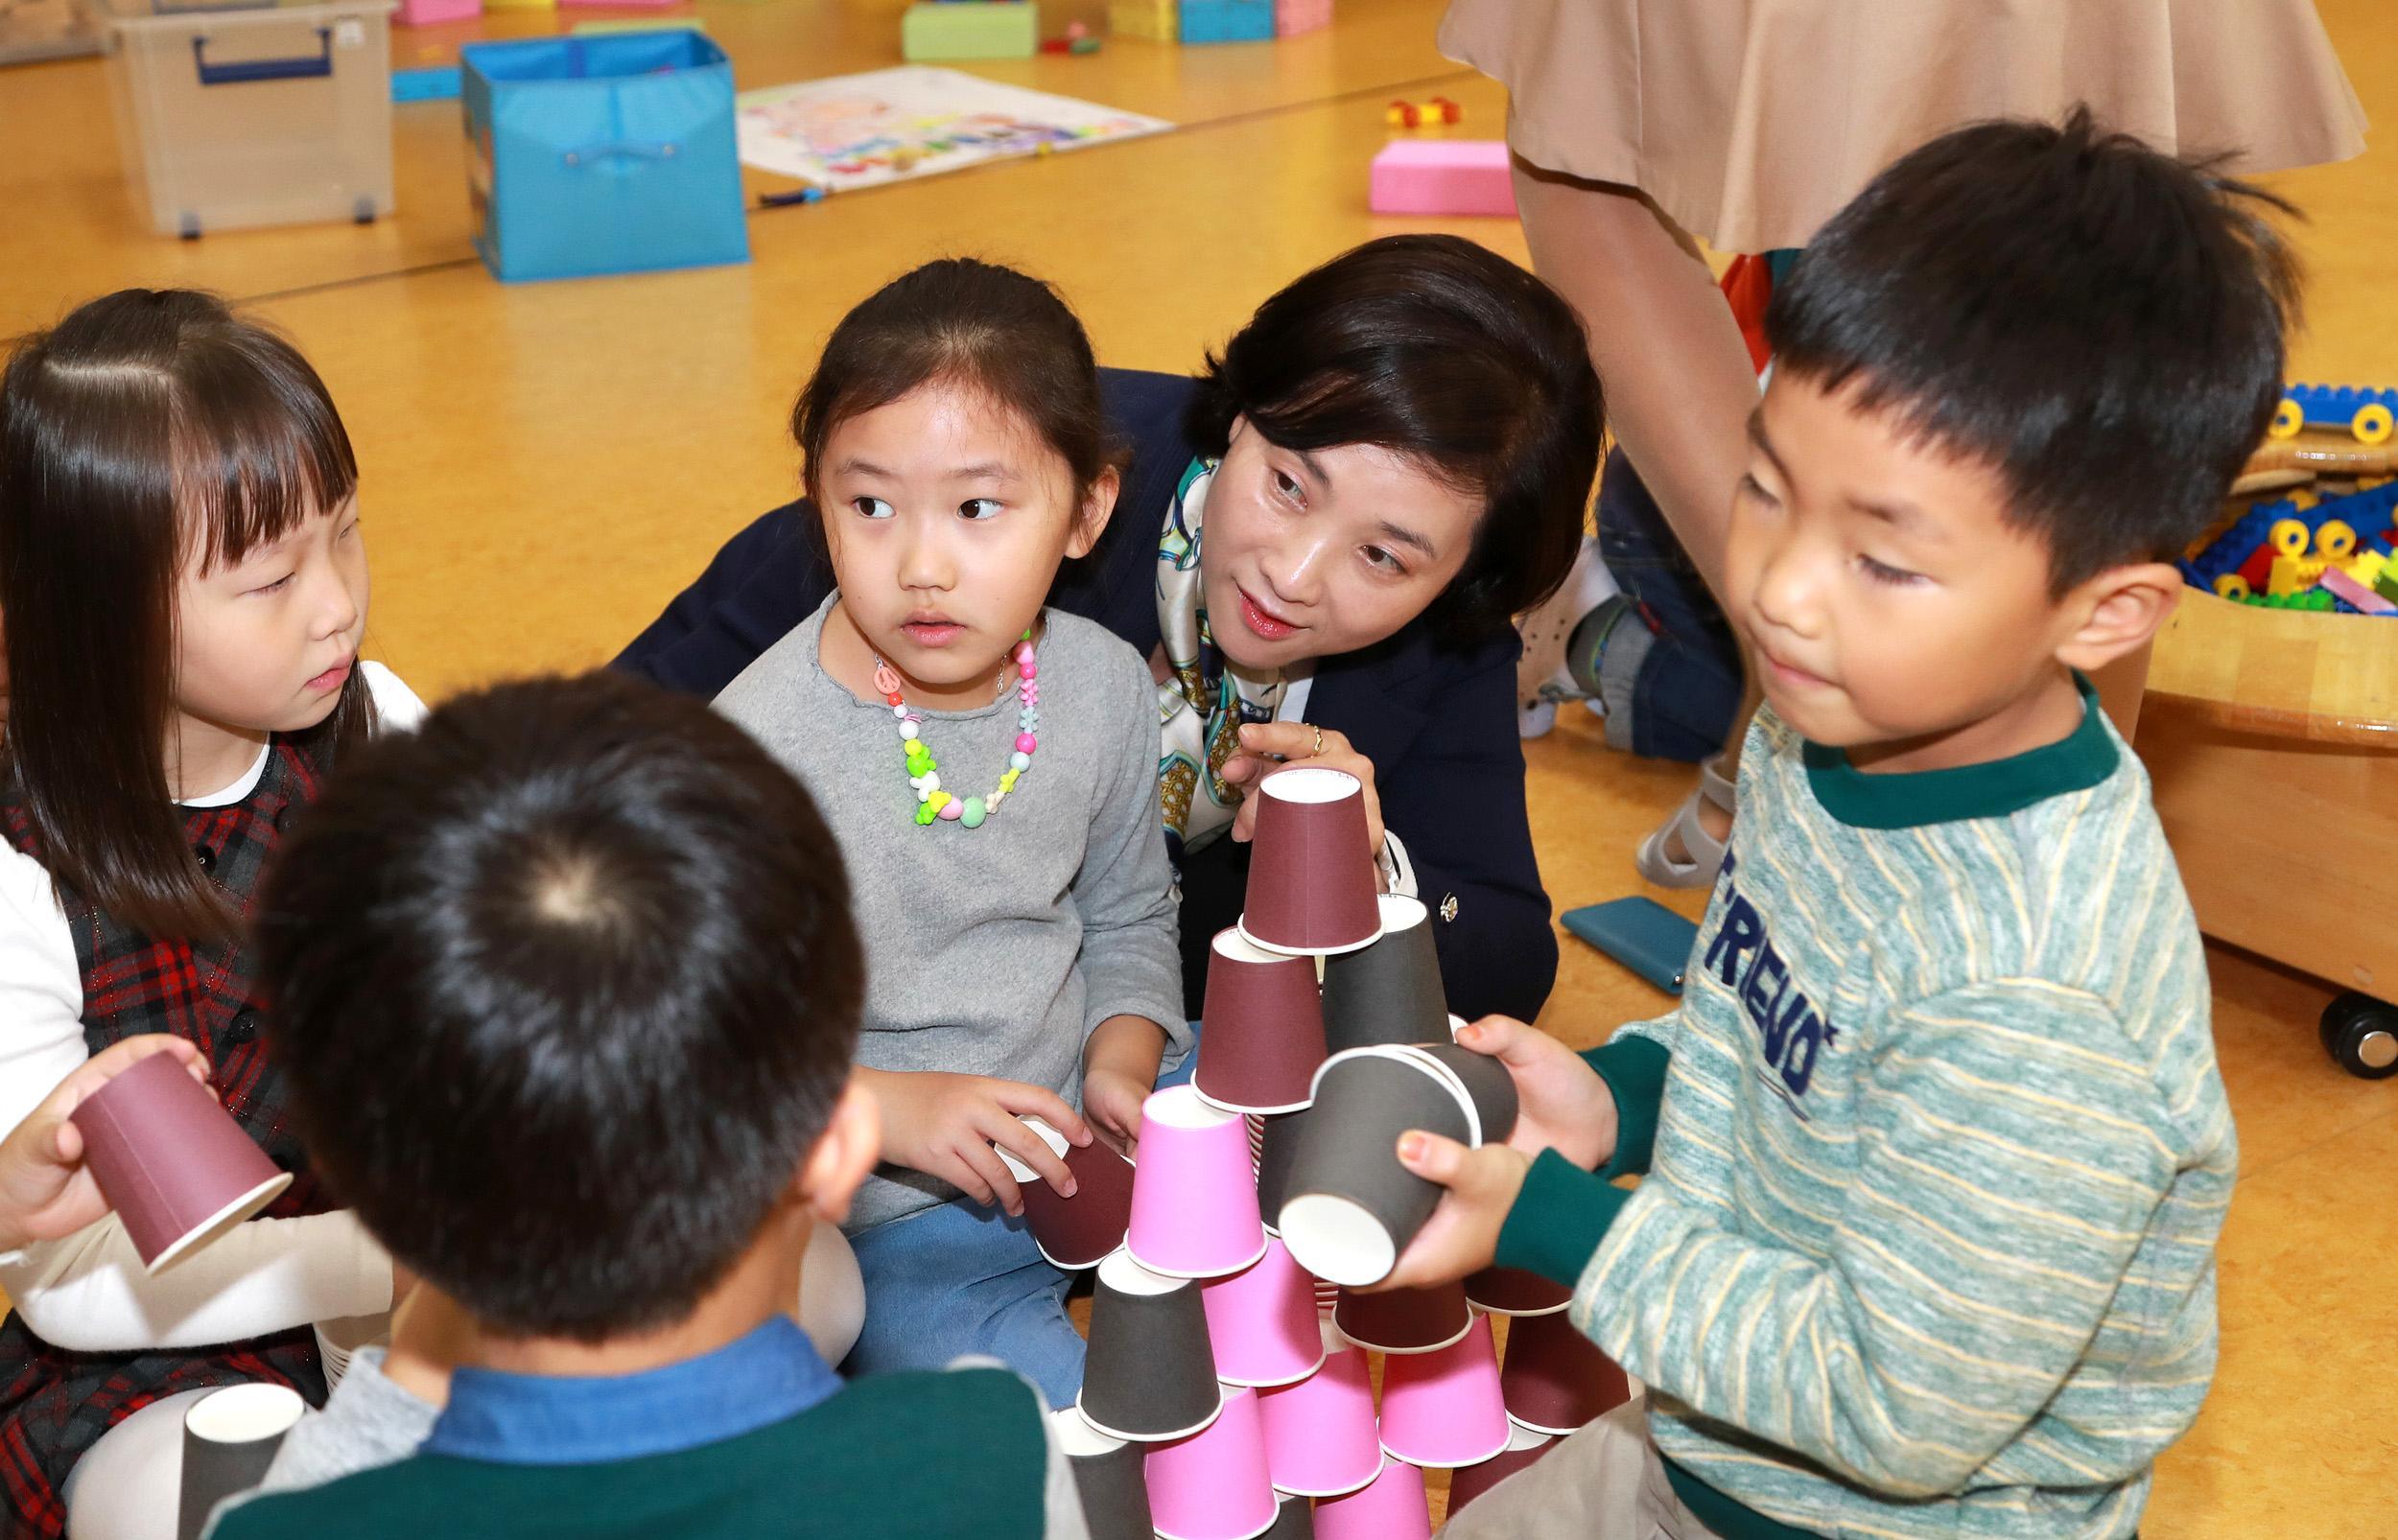 Deputy PM Yoo Eun-He visits Chamsaem Kindergarten Elementary School 사진